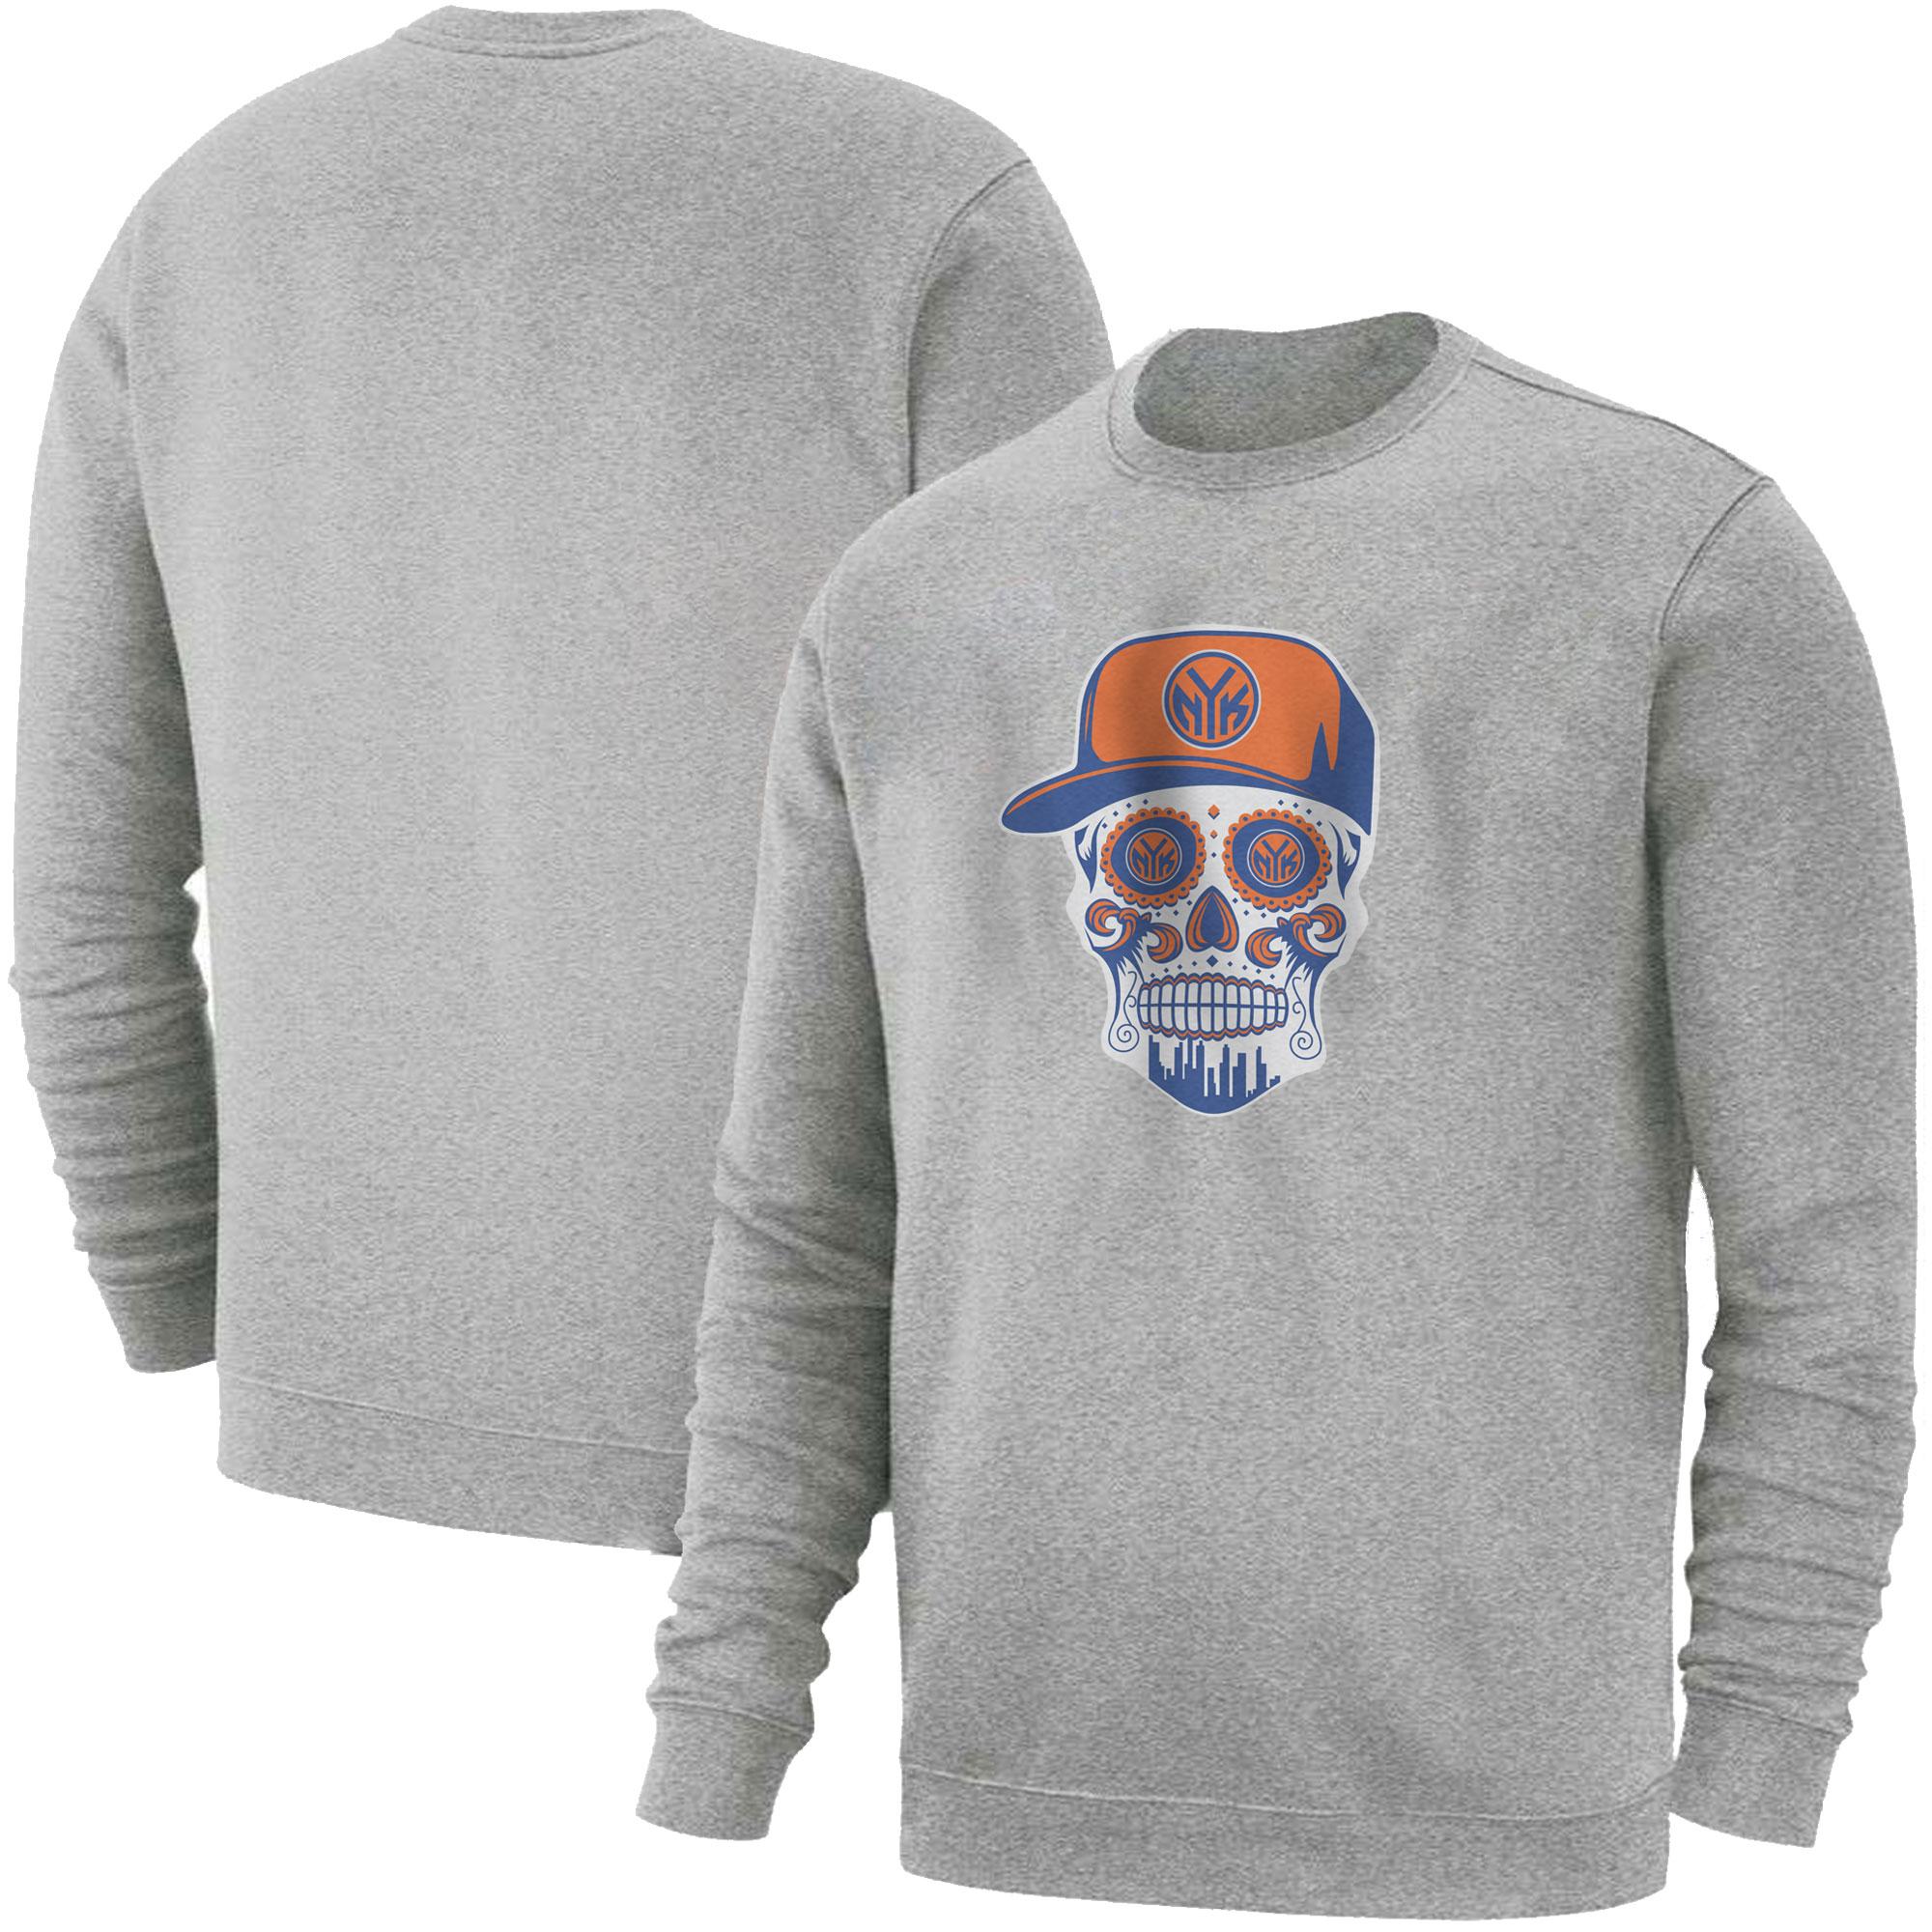 Knicks Skull  Basic (BSC-GRY-NP-458-NBA-NYK-SKULL)